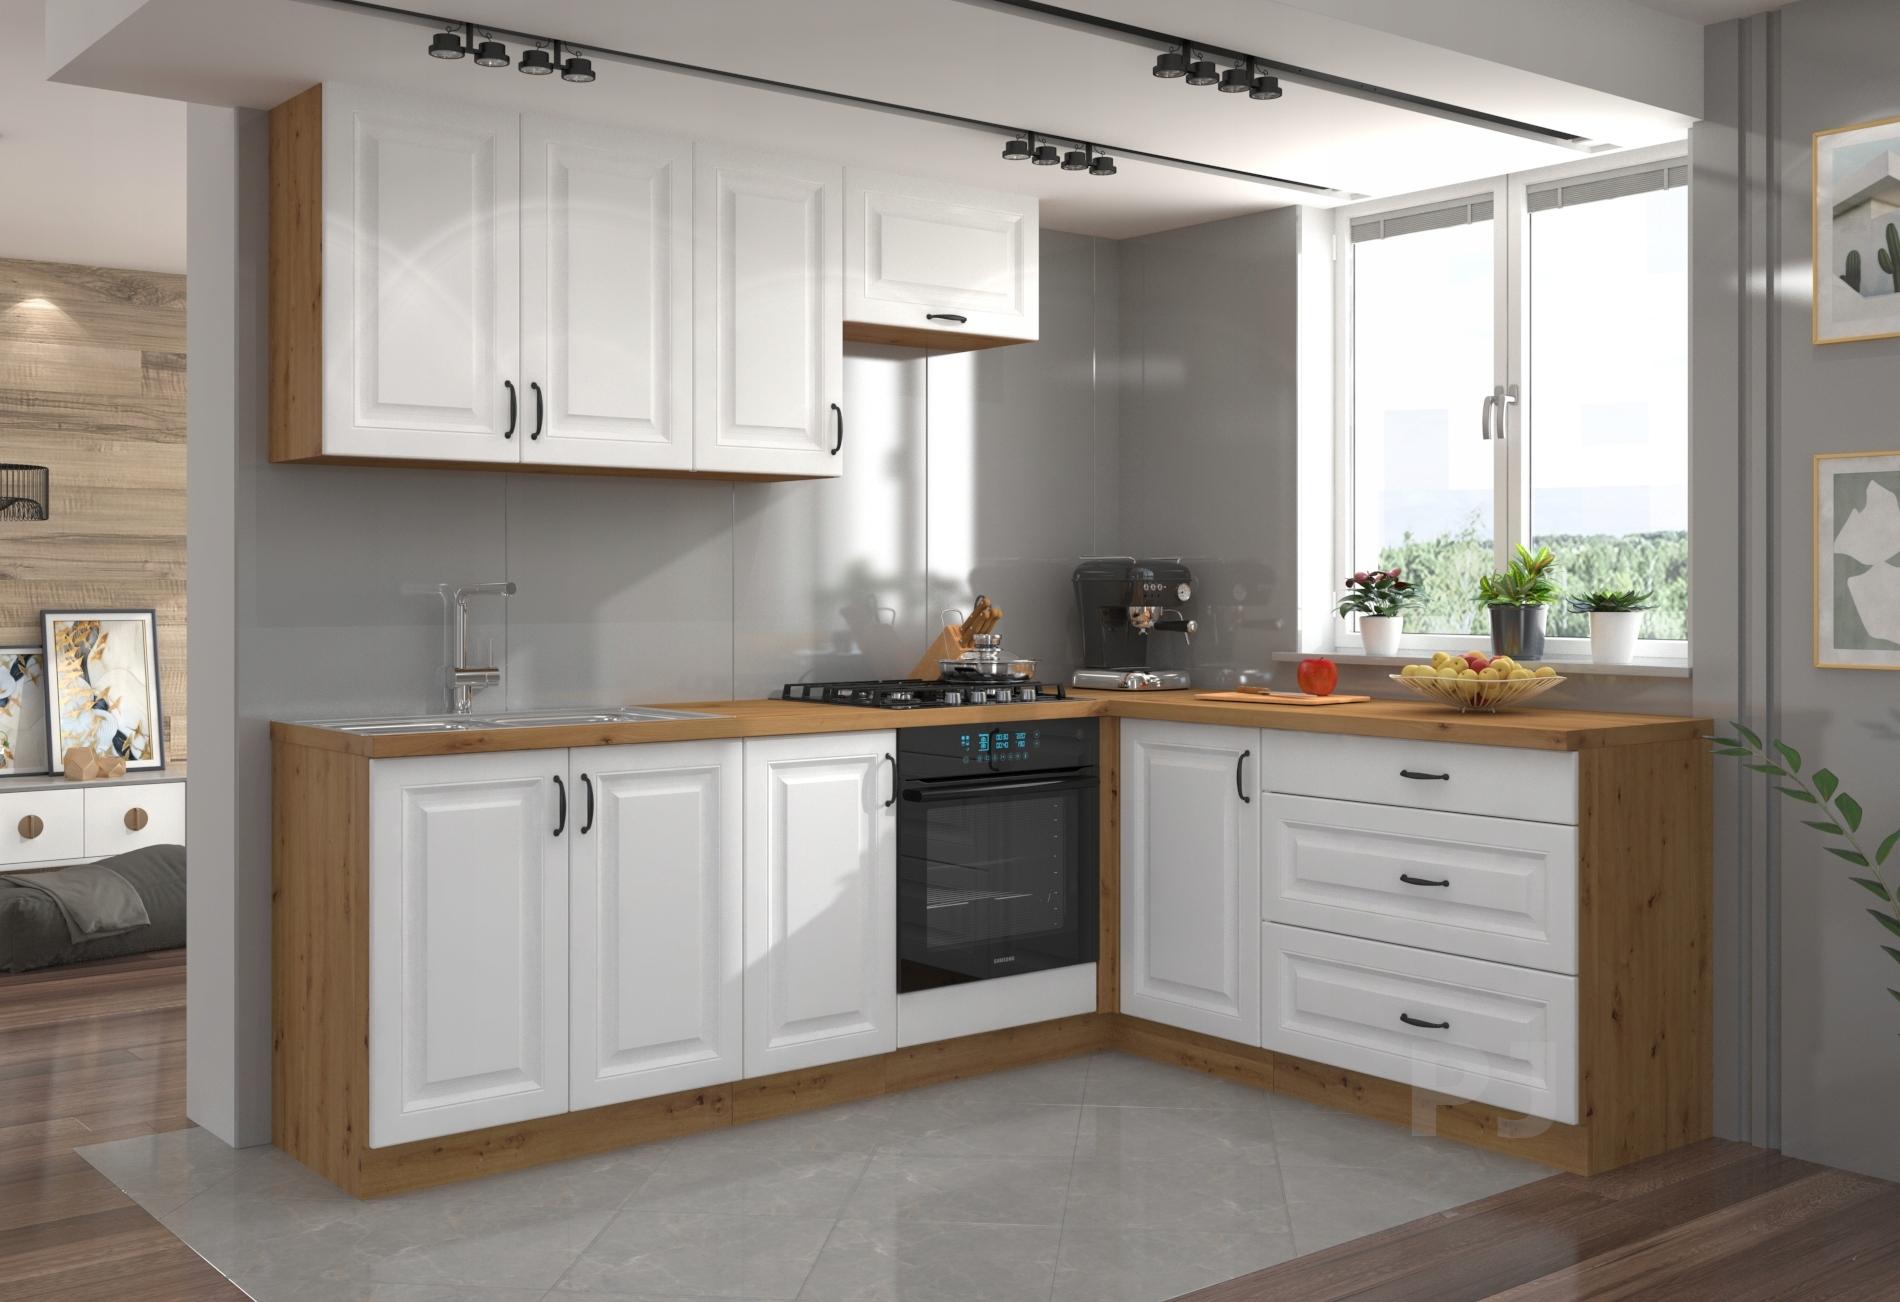 STILO белая кухня / угловая кухонная мебель